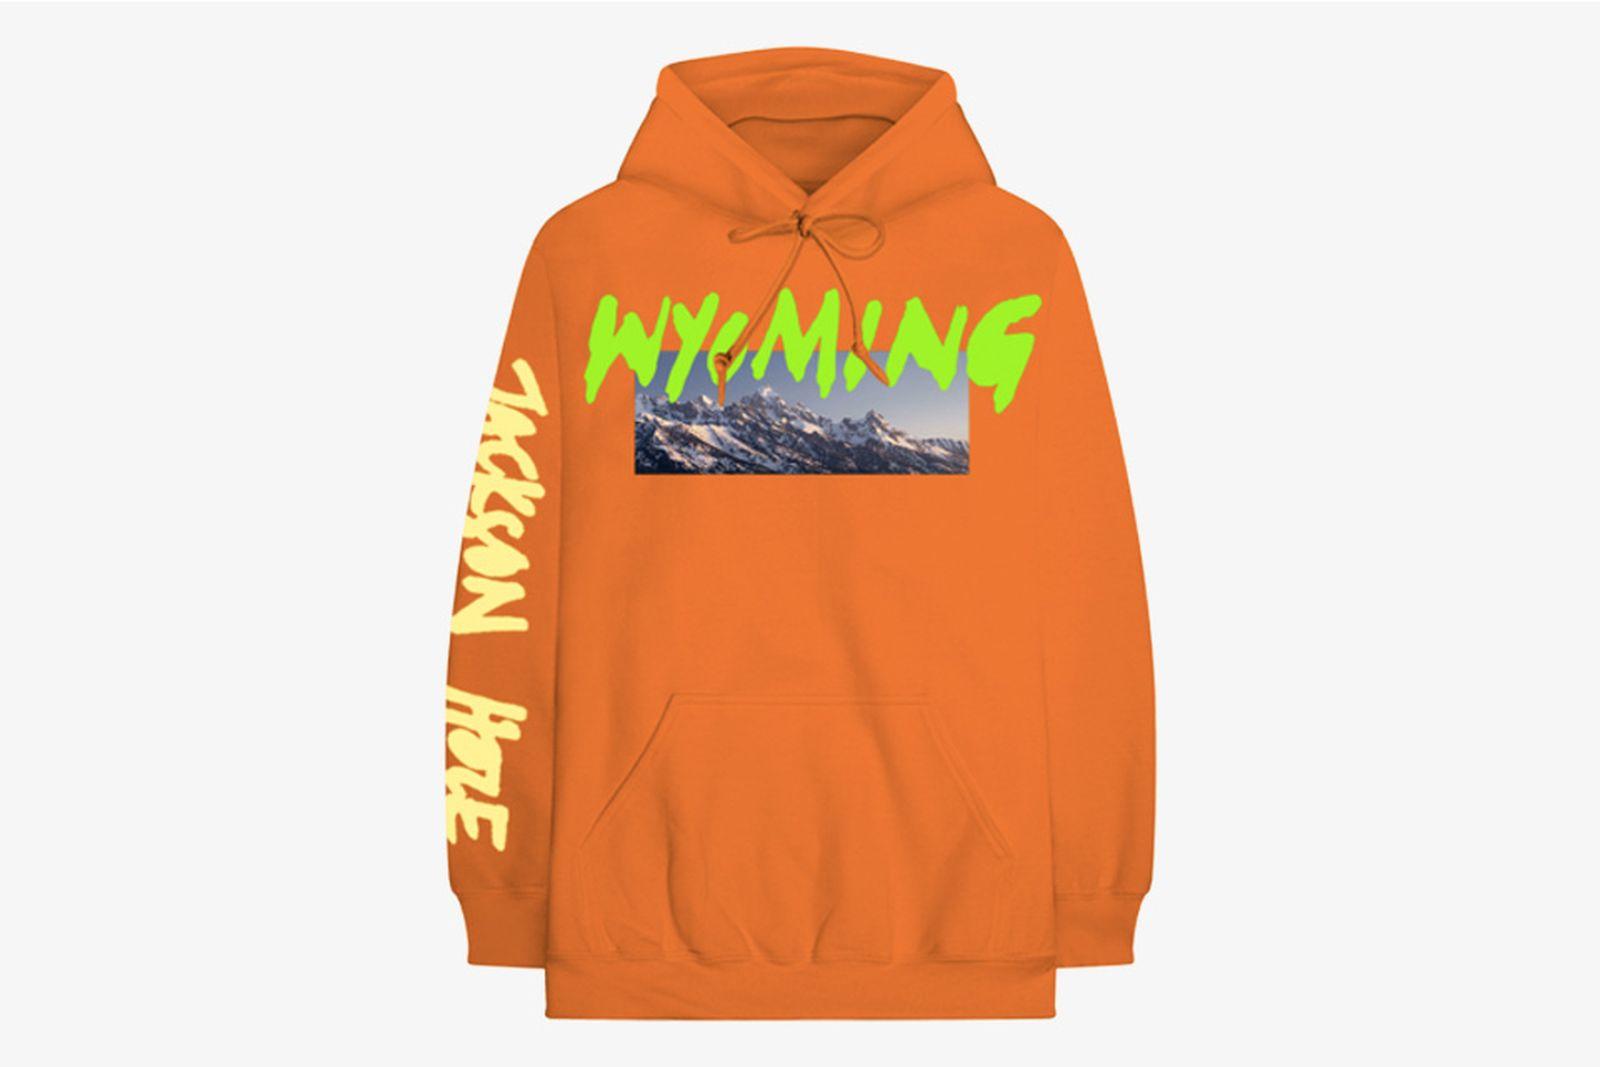 kanye west wyoming merch ASAP Ferg Merchandise Travis Scott